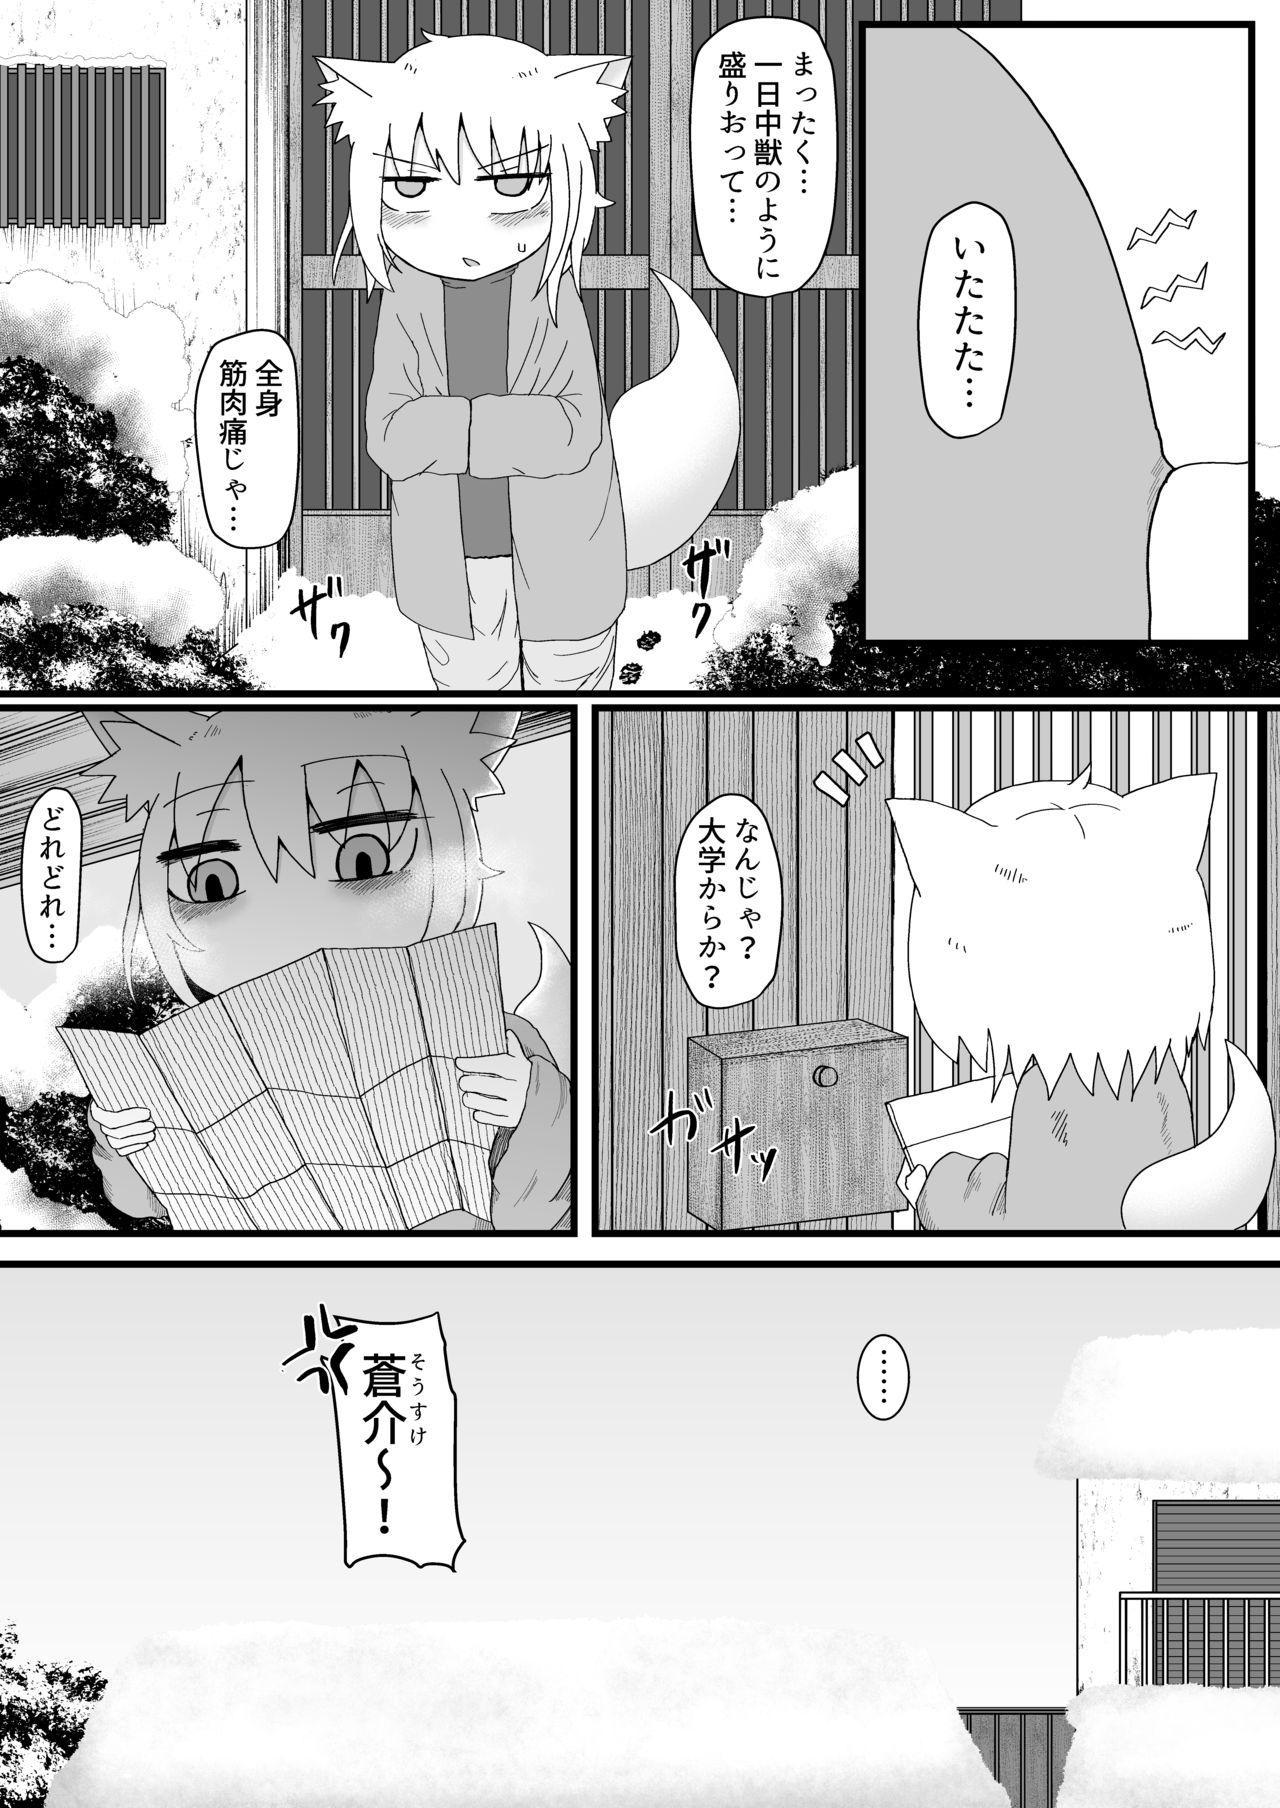 Loli Baba Okaa-san wa Oshi ni Yowai 2 14